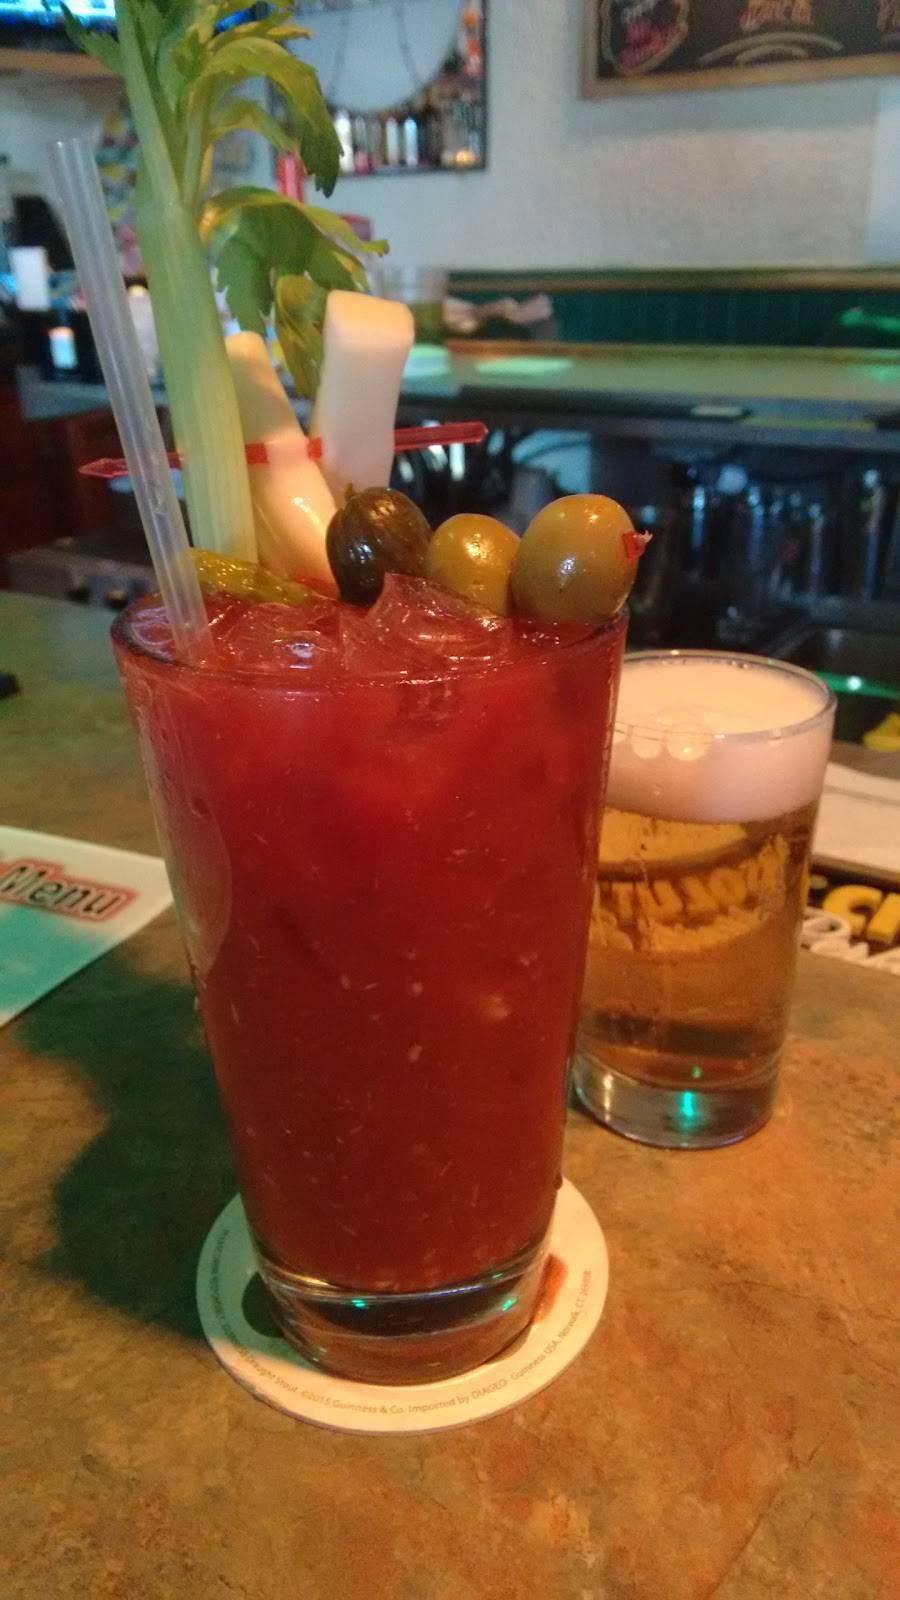 Skippys Burger Bar   night club   1603, 113 Green Bay Rd, Thiensville, WI 53092, USA   2625121240 OR +1 262-512-1240